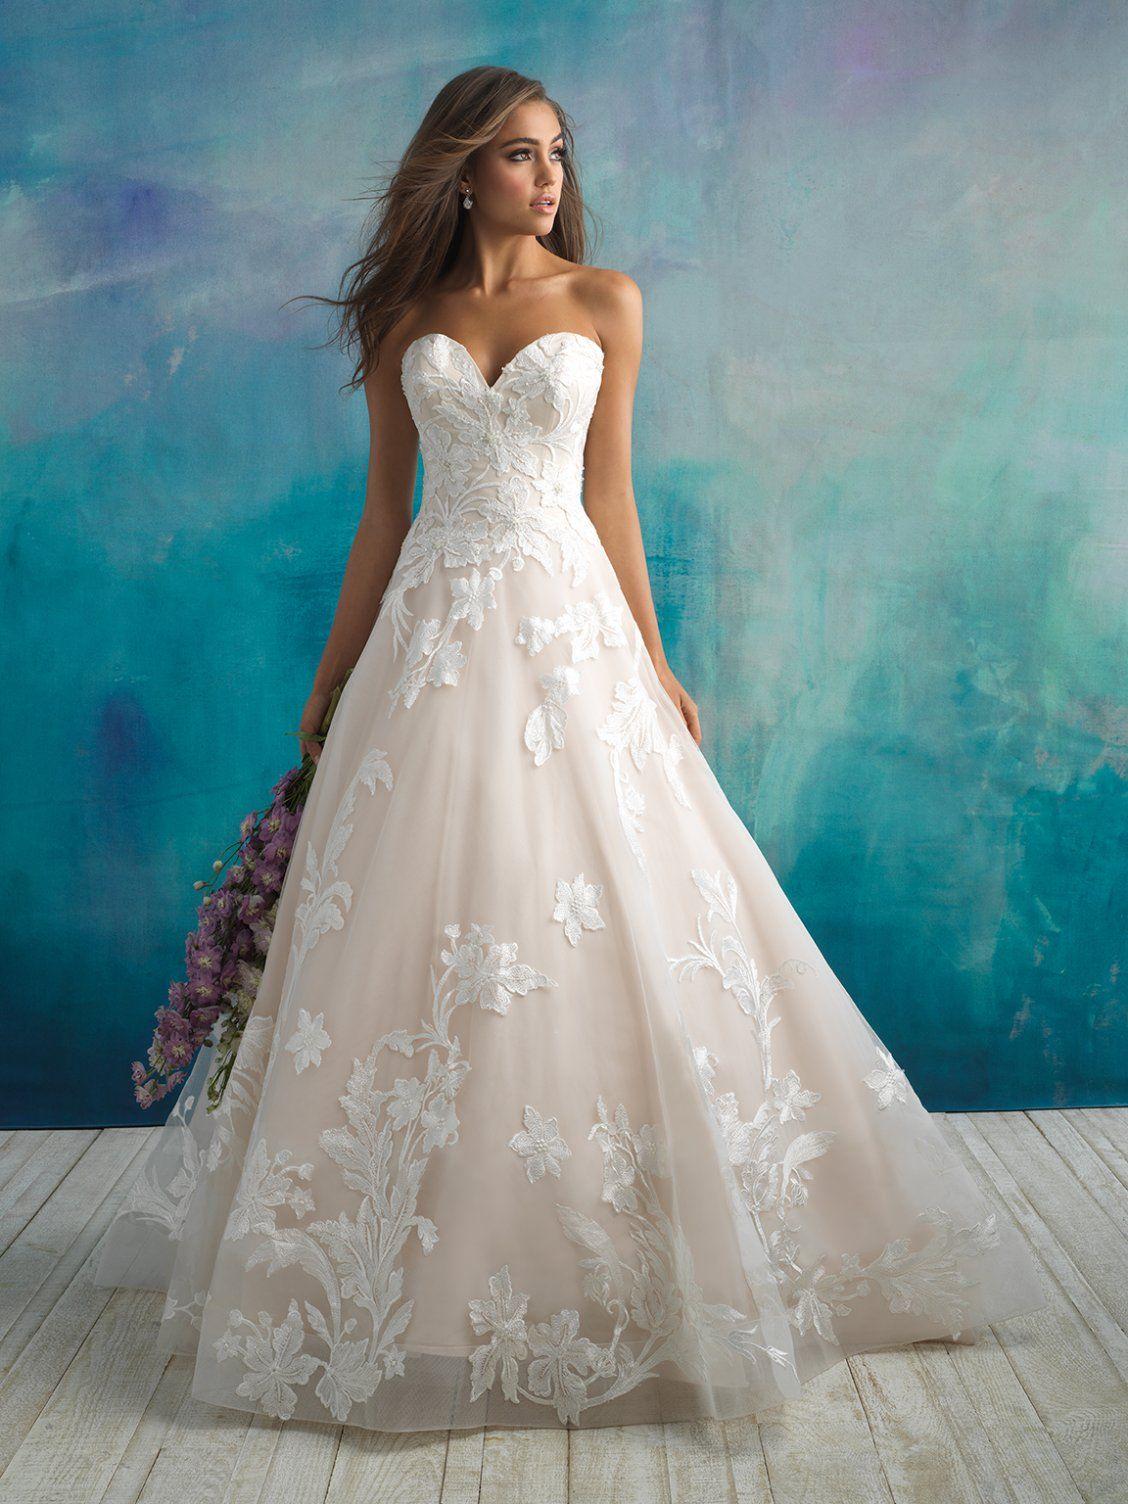 Allure wedding dress  Allure Bridals   婚禮  Pinterest  Allure bridal Wedding